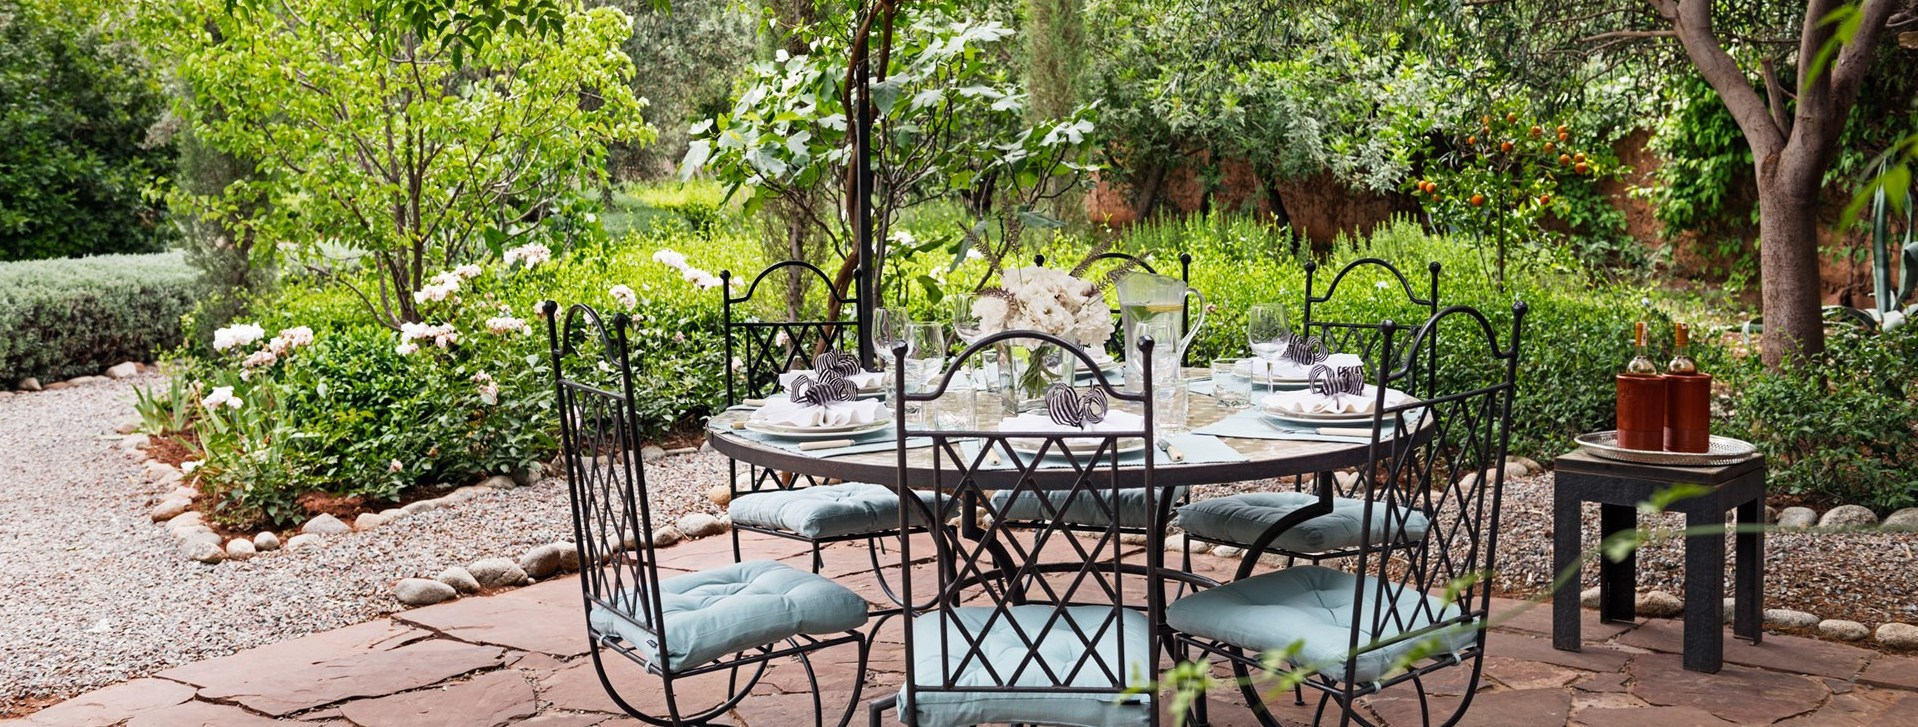 villa-dar-tamazerte-garden-terrace